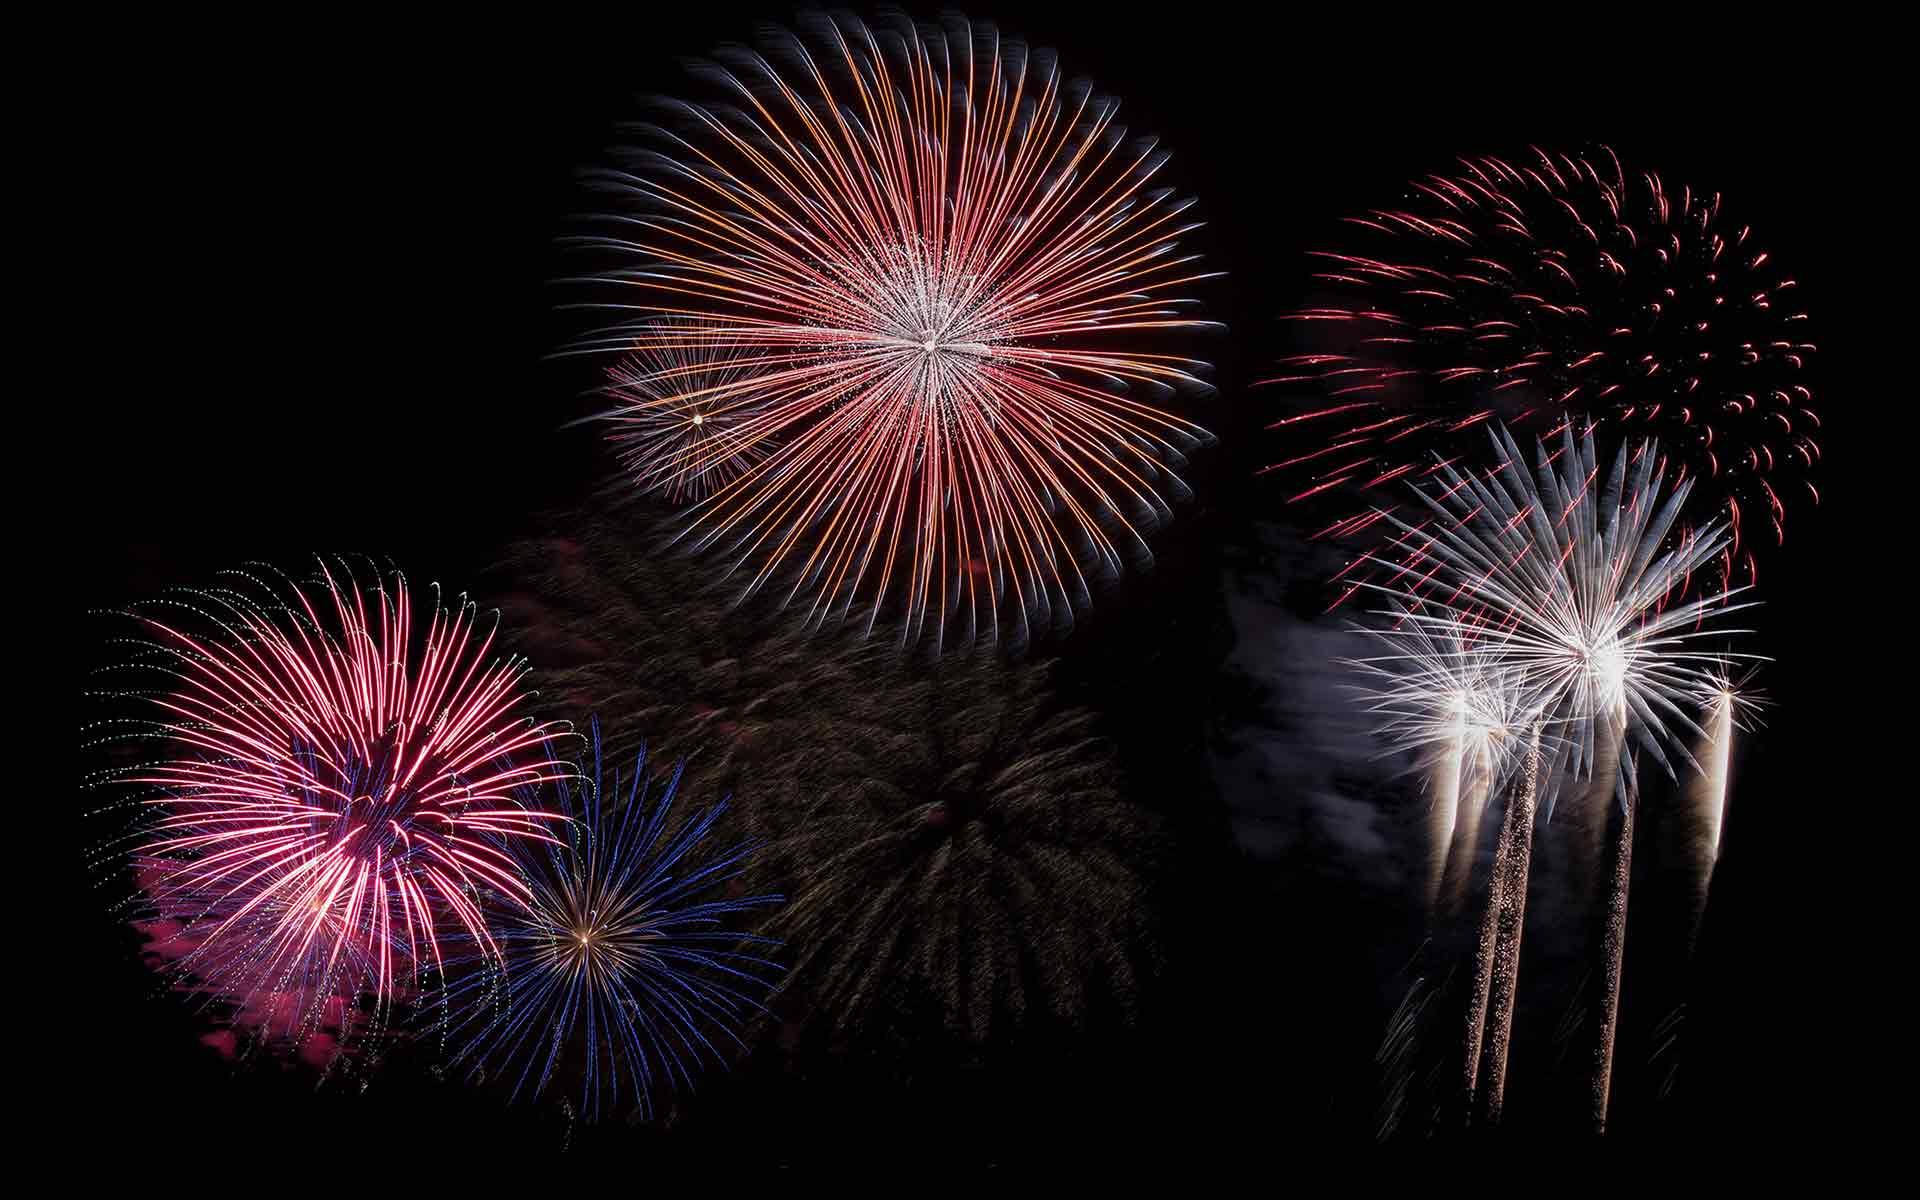 Fireworks Against the Sky